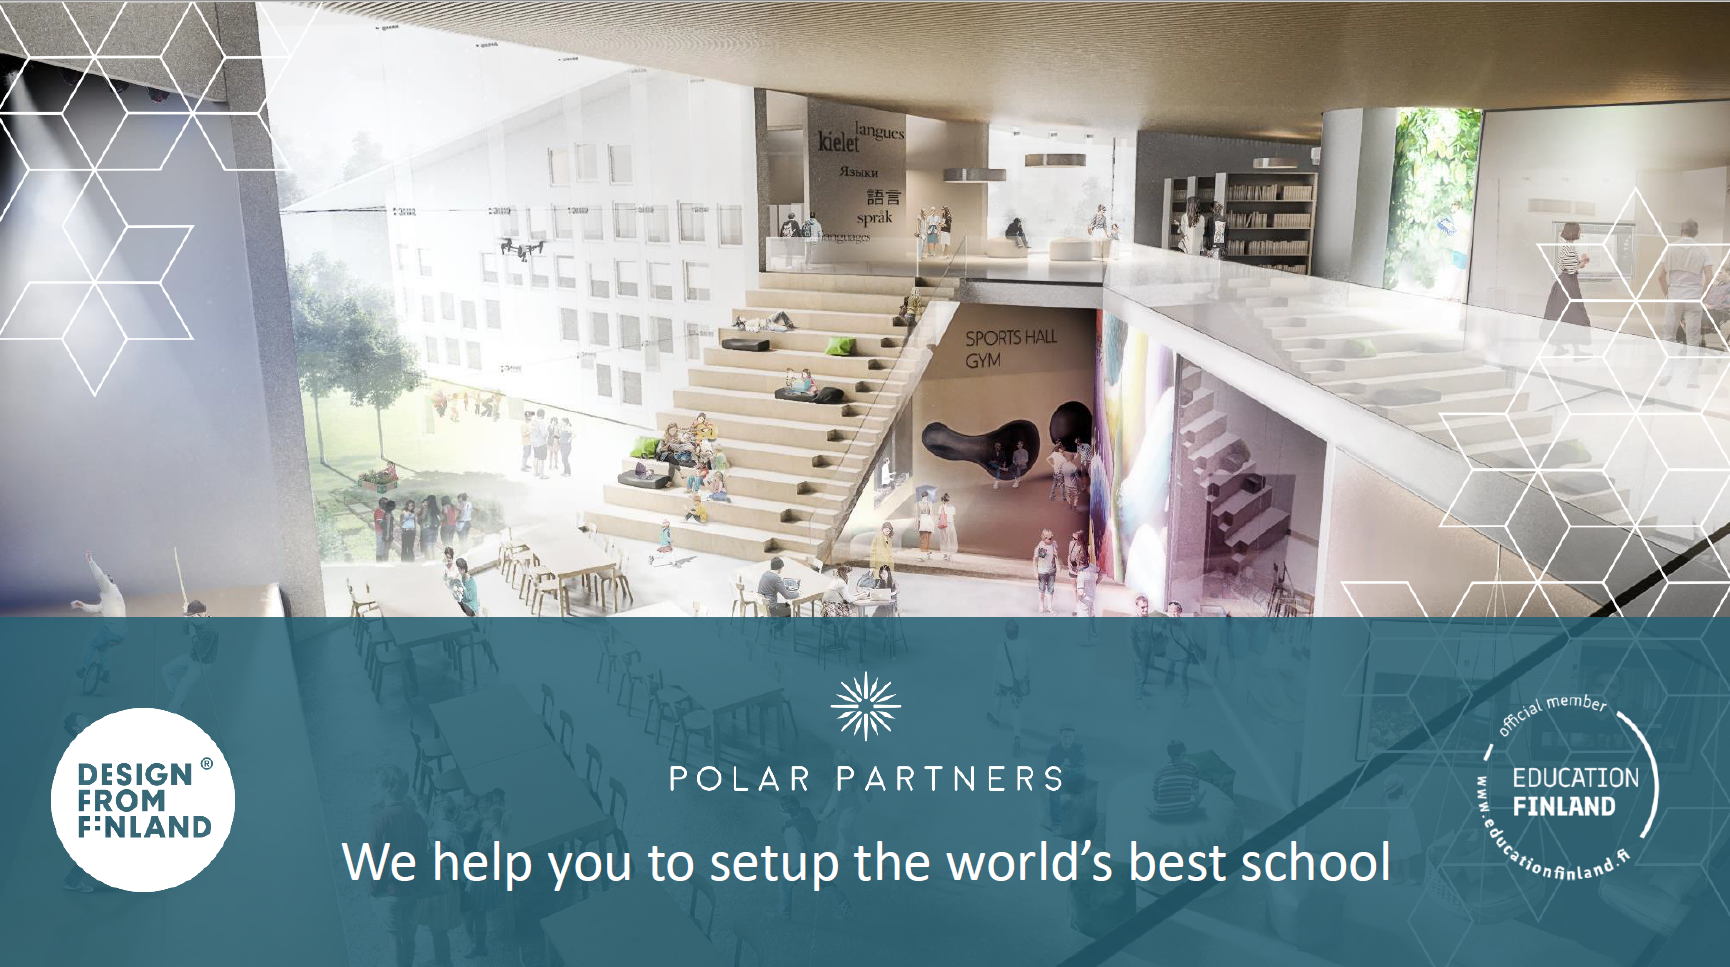 Polar partners